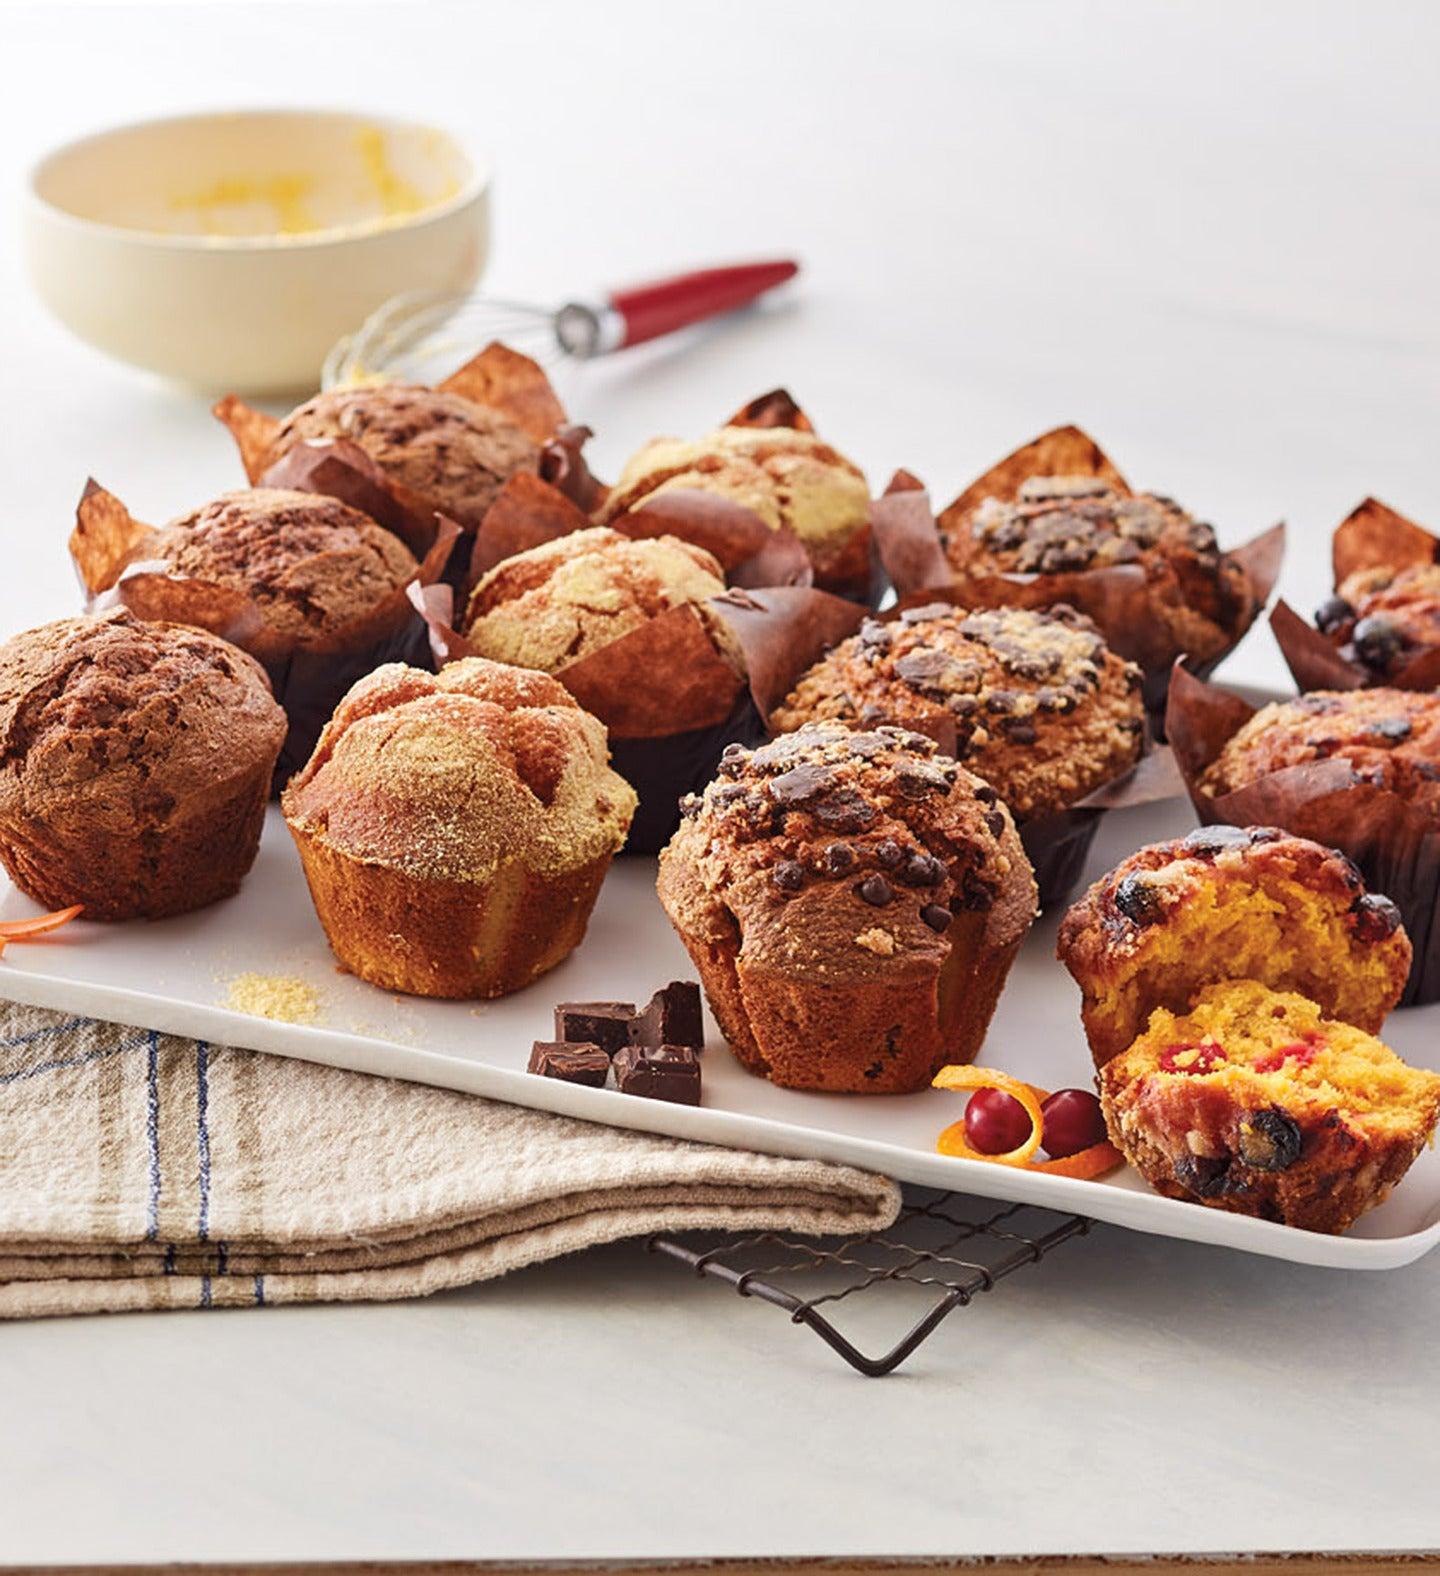 Davidovich Muffins